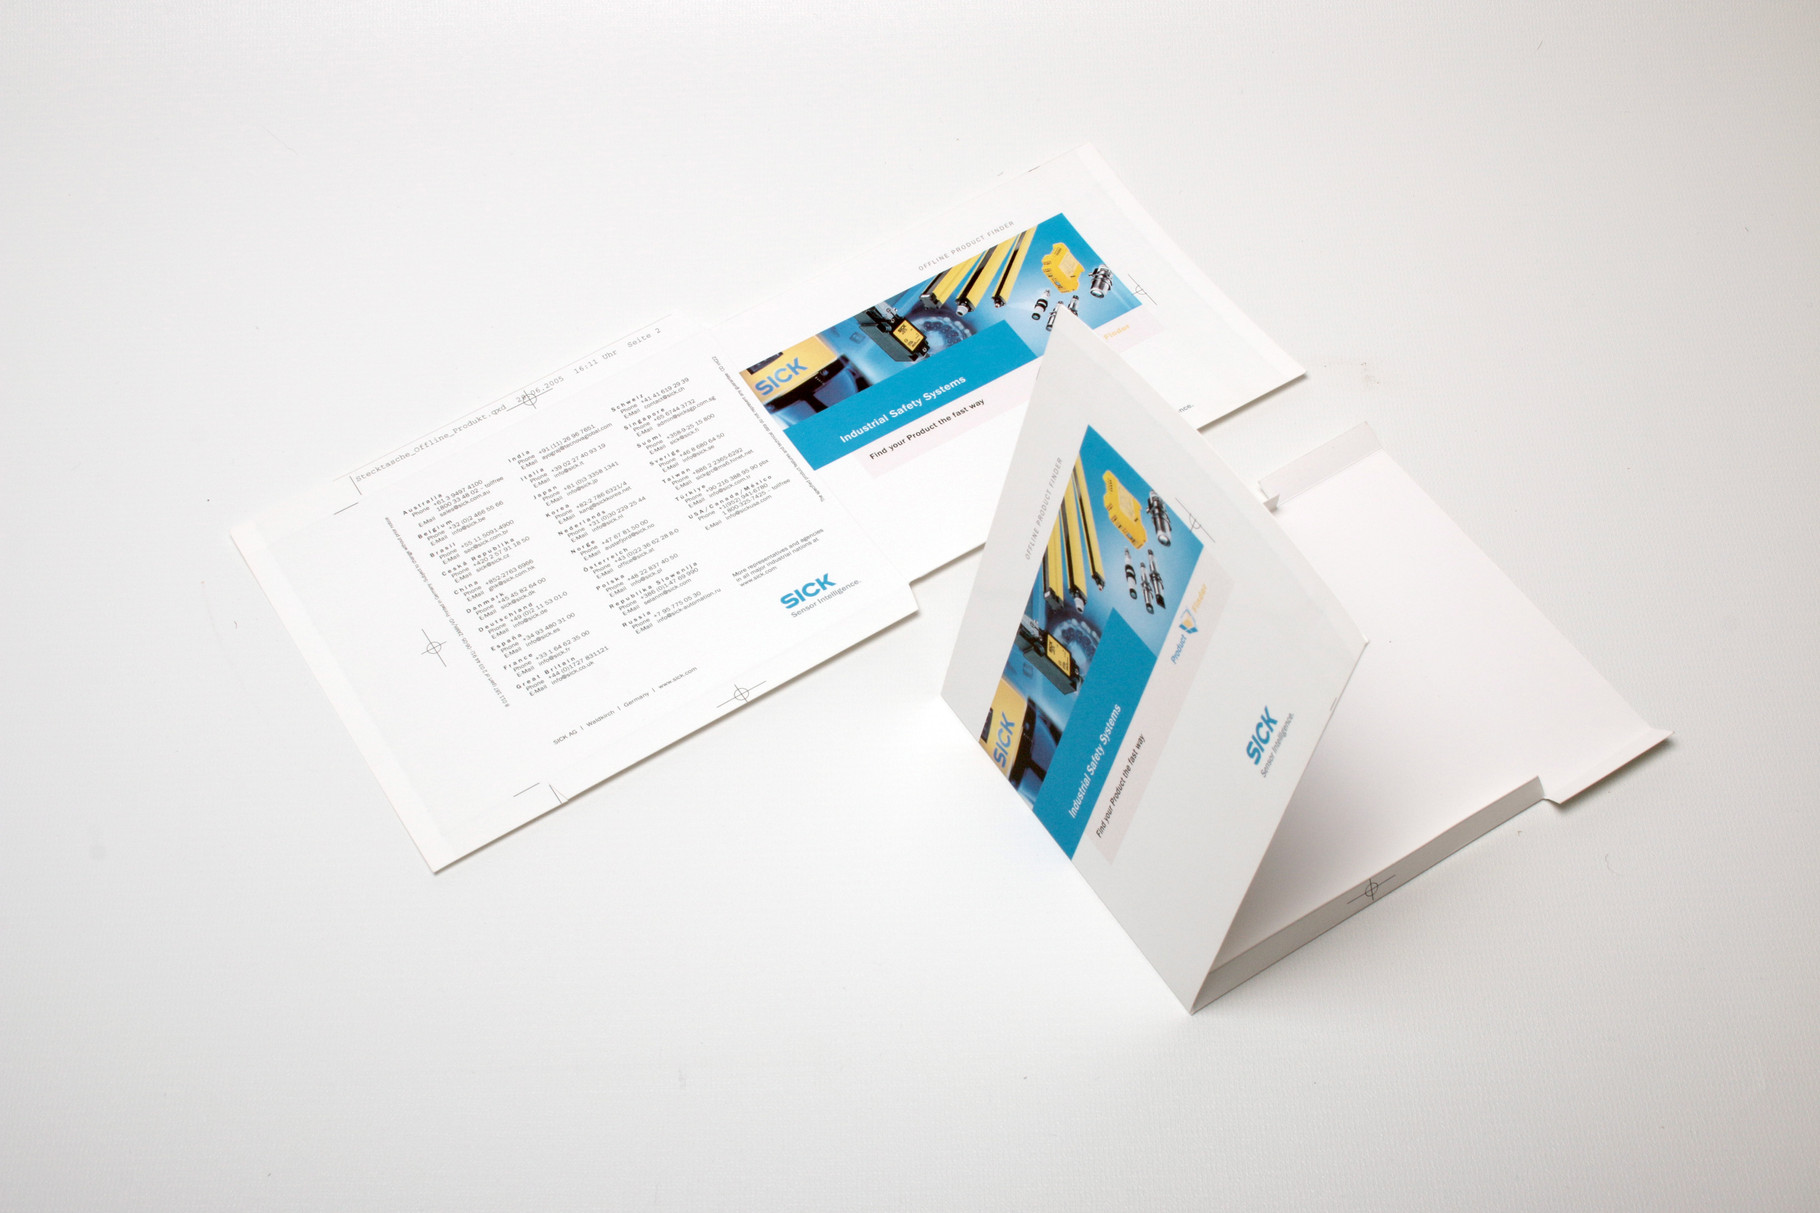 Digitaldruck Verpackungsmittel